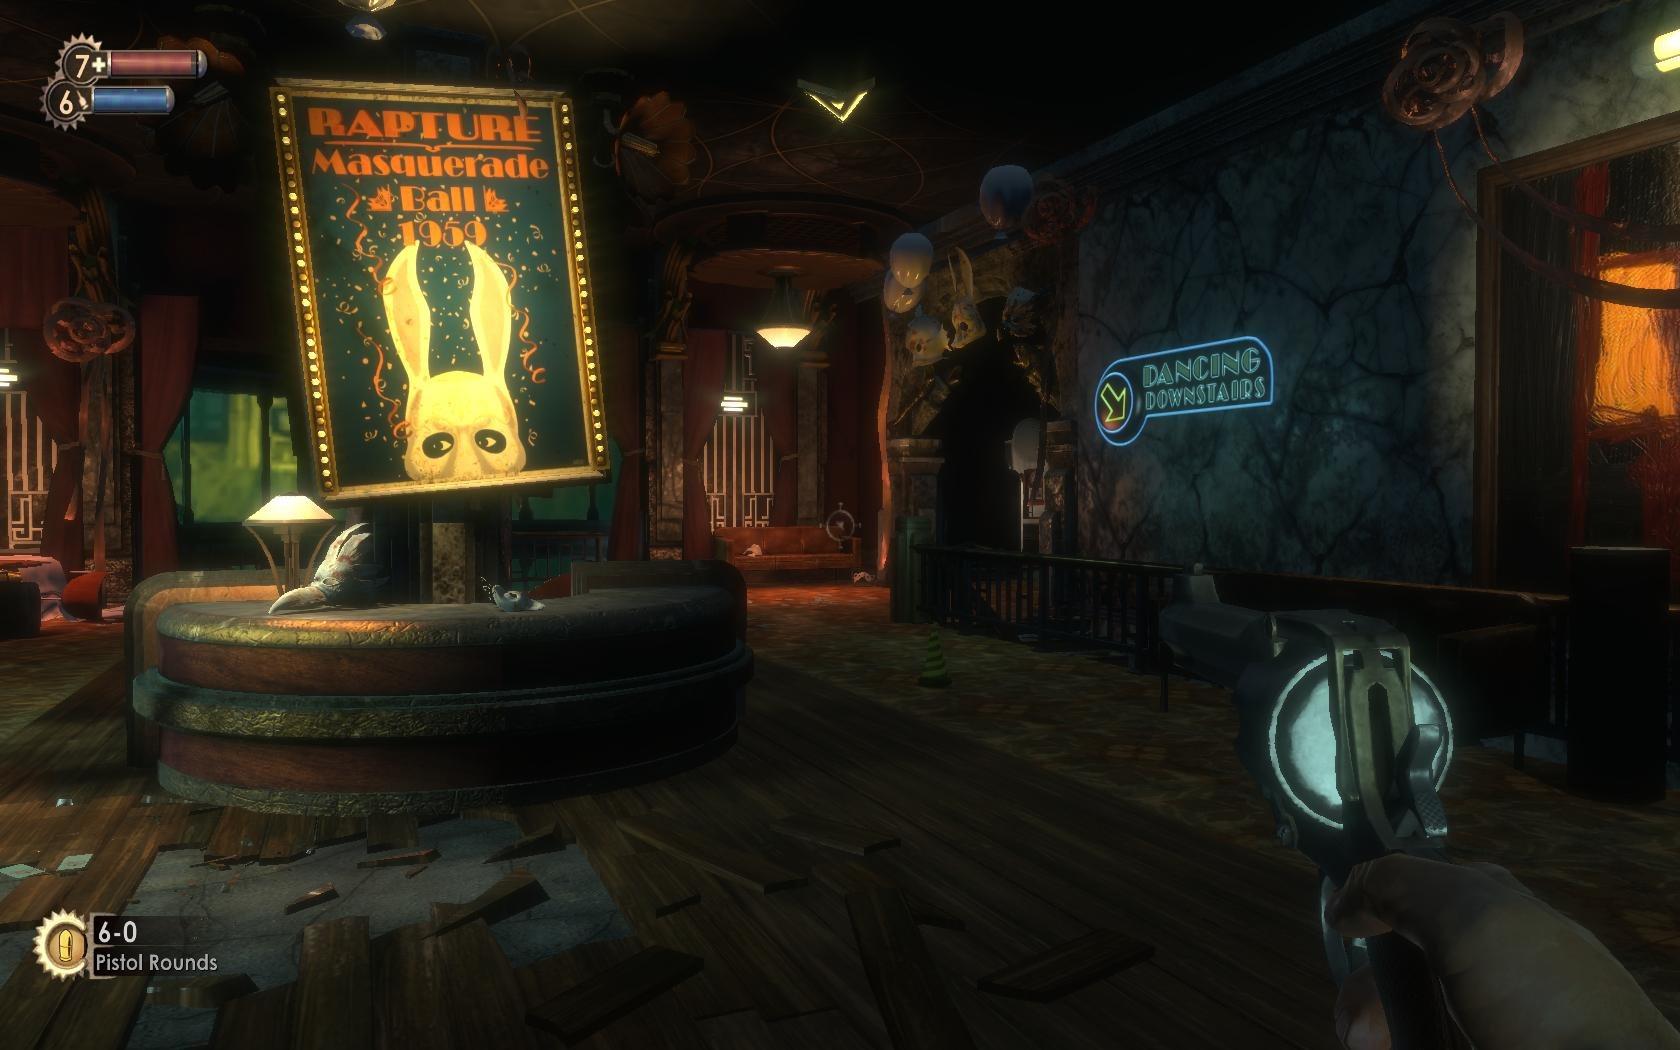 BioShock Сollection (2007-2013) [Multi] (1.1/1.5.0.19/1.1.22.55730) SteamRip SmS